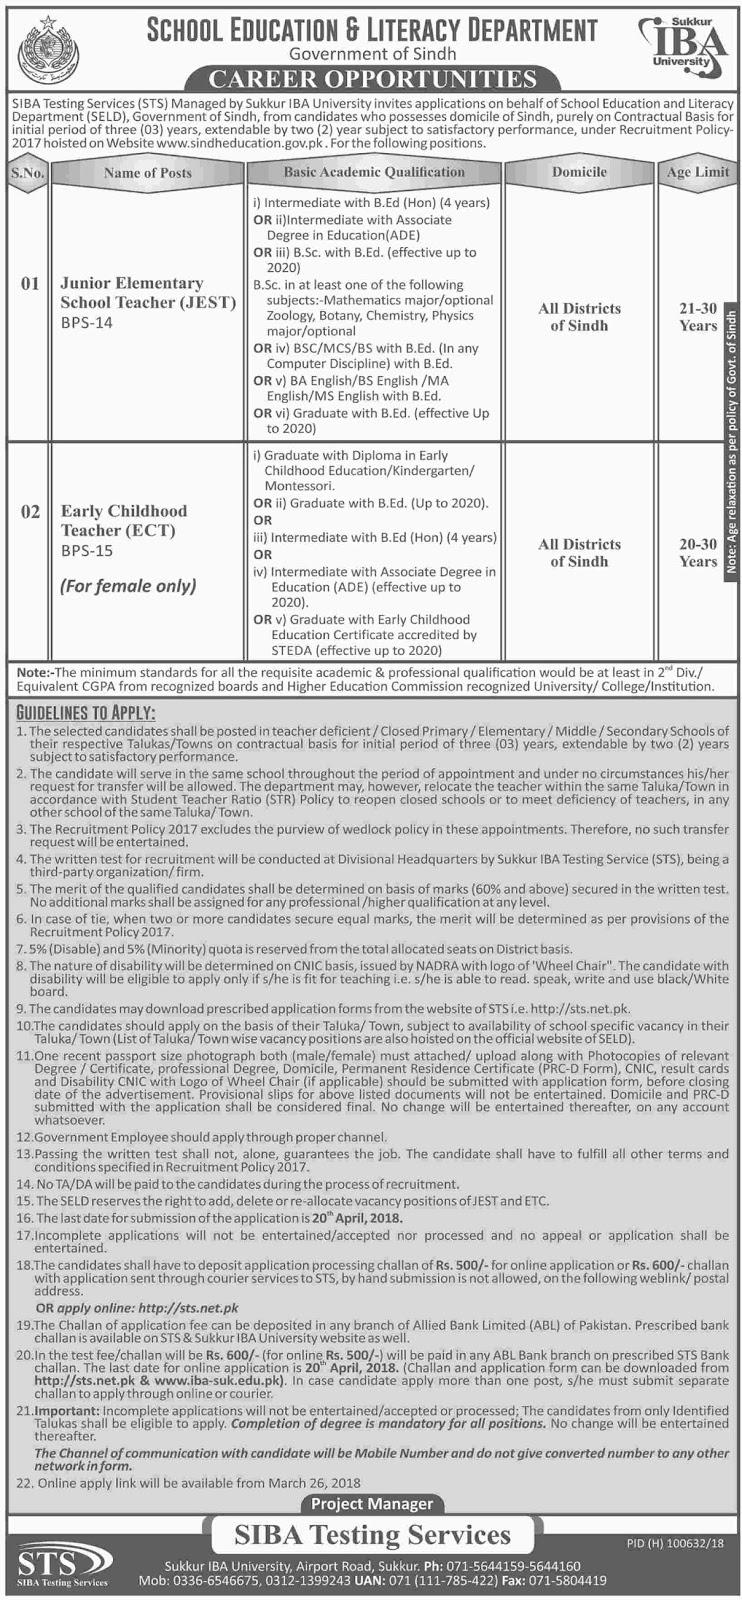 School Education Department Sindh Jobs 2018